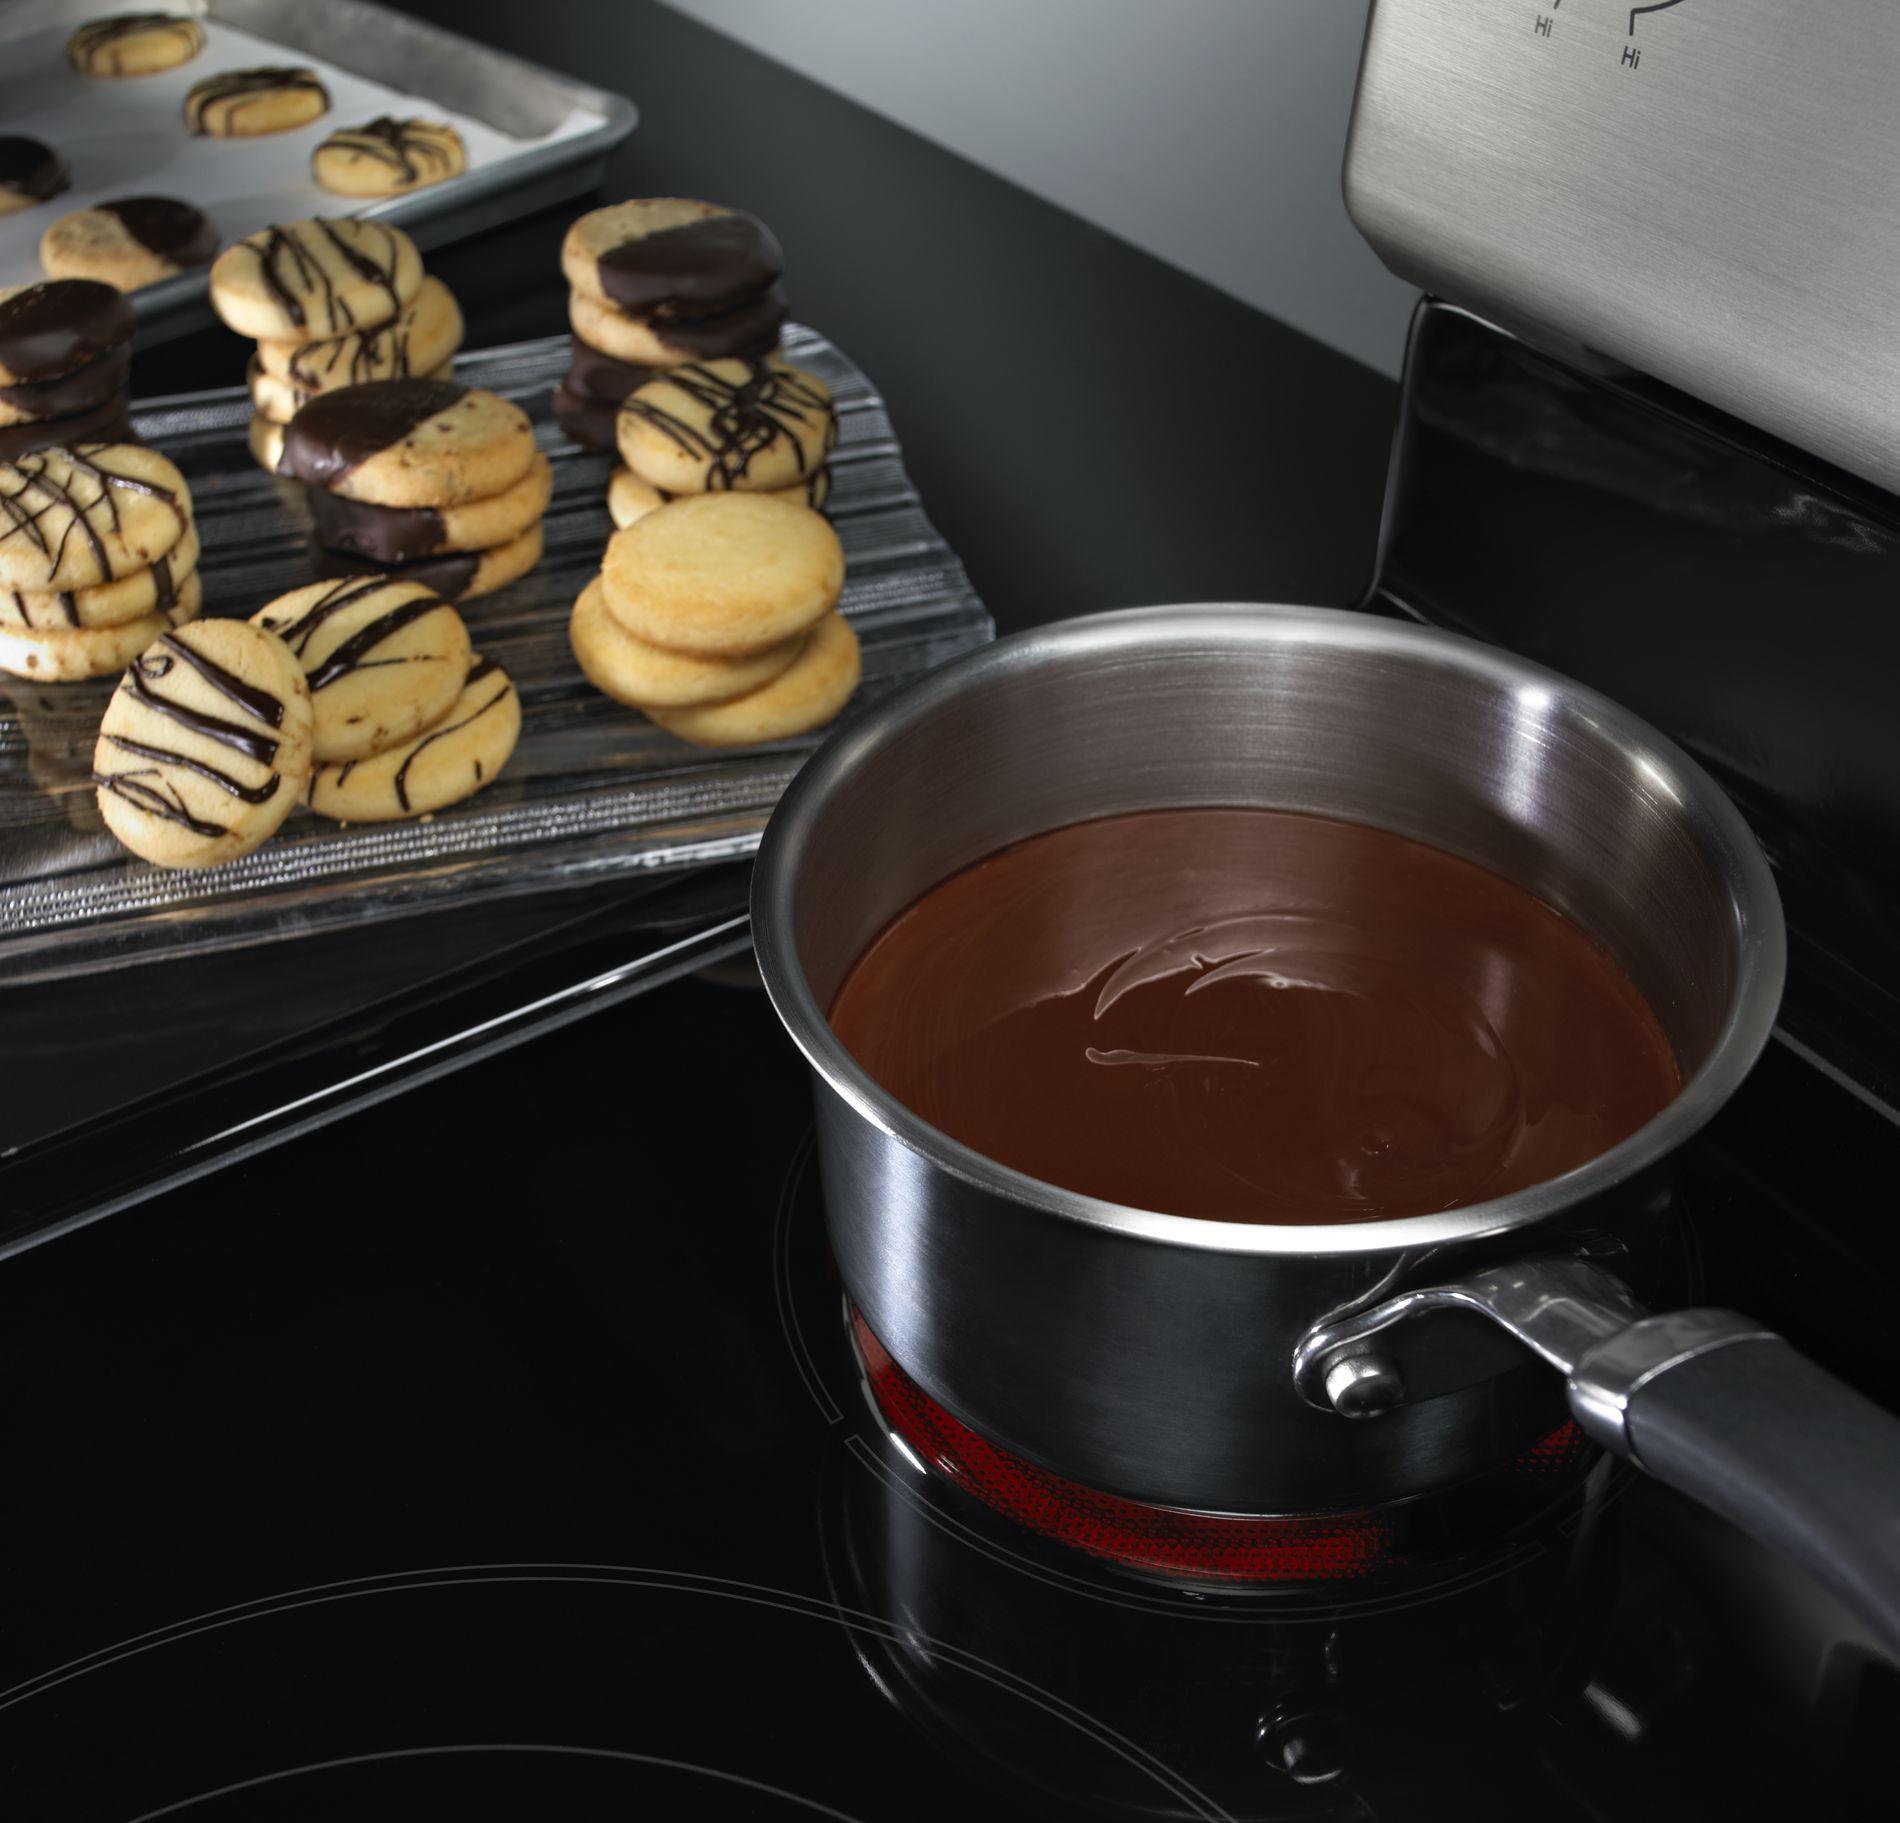 KitchenAid 6.2 cu. ft. Electric Range w/ Event-Heat™ Technology - Black